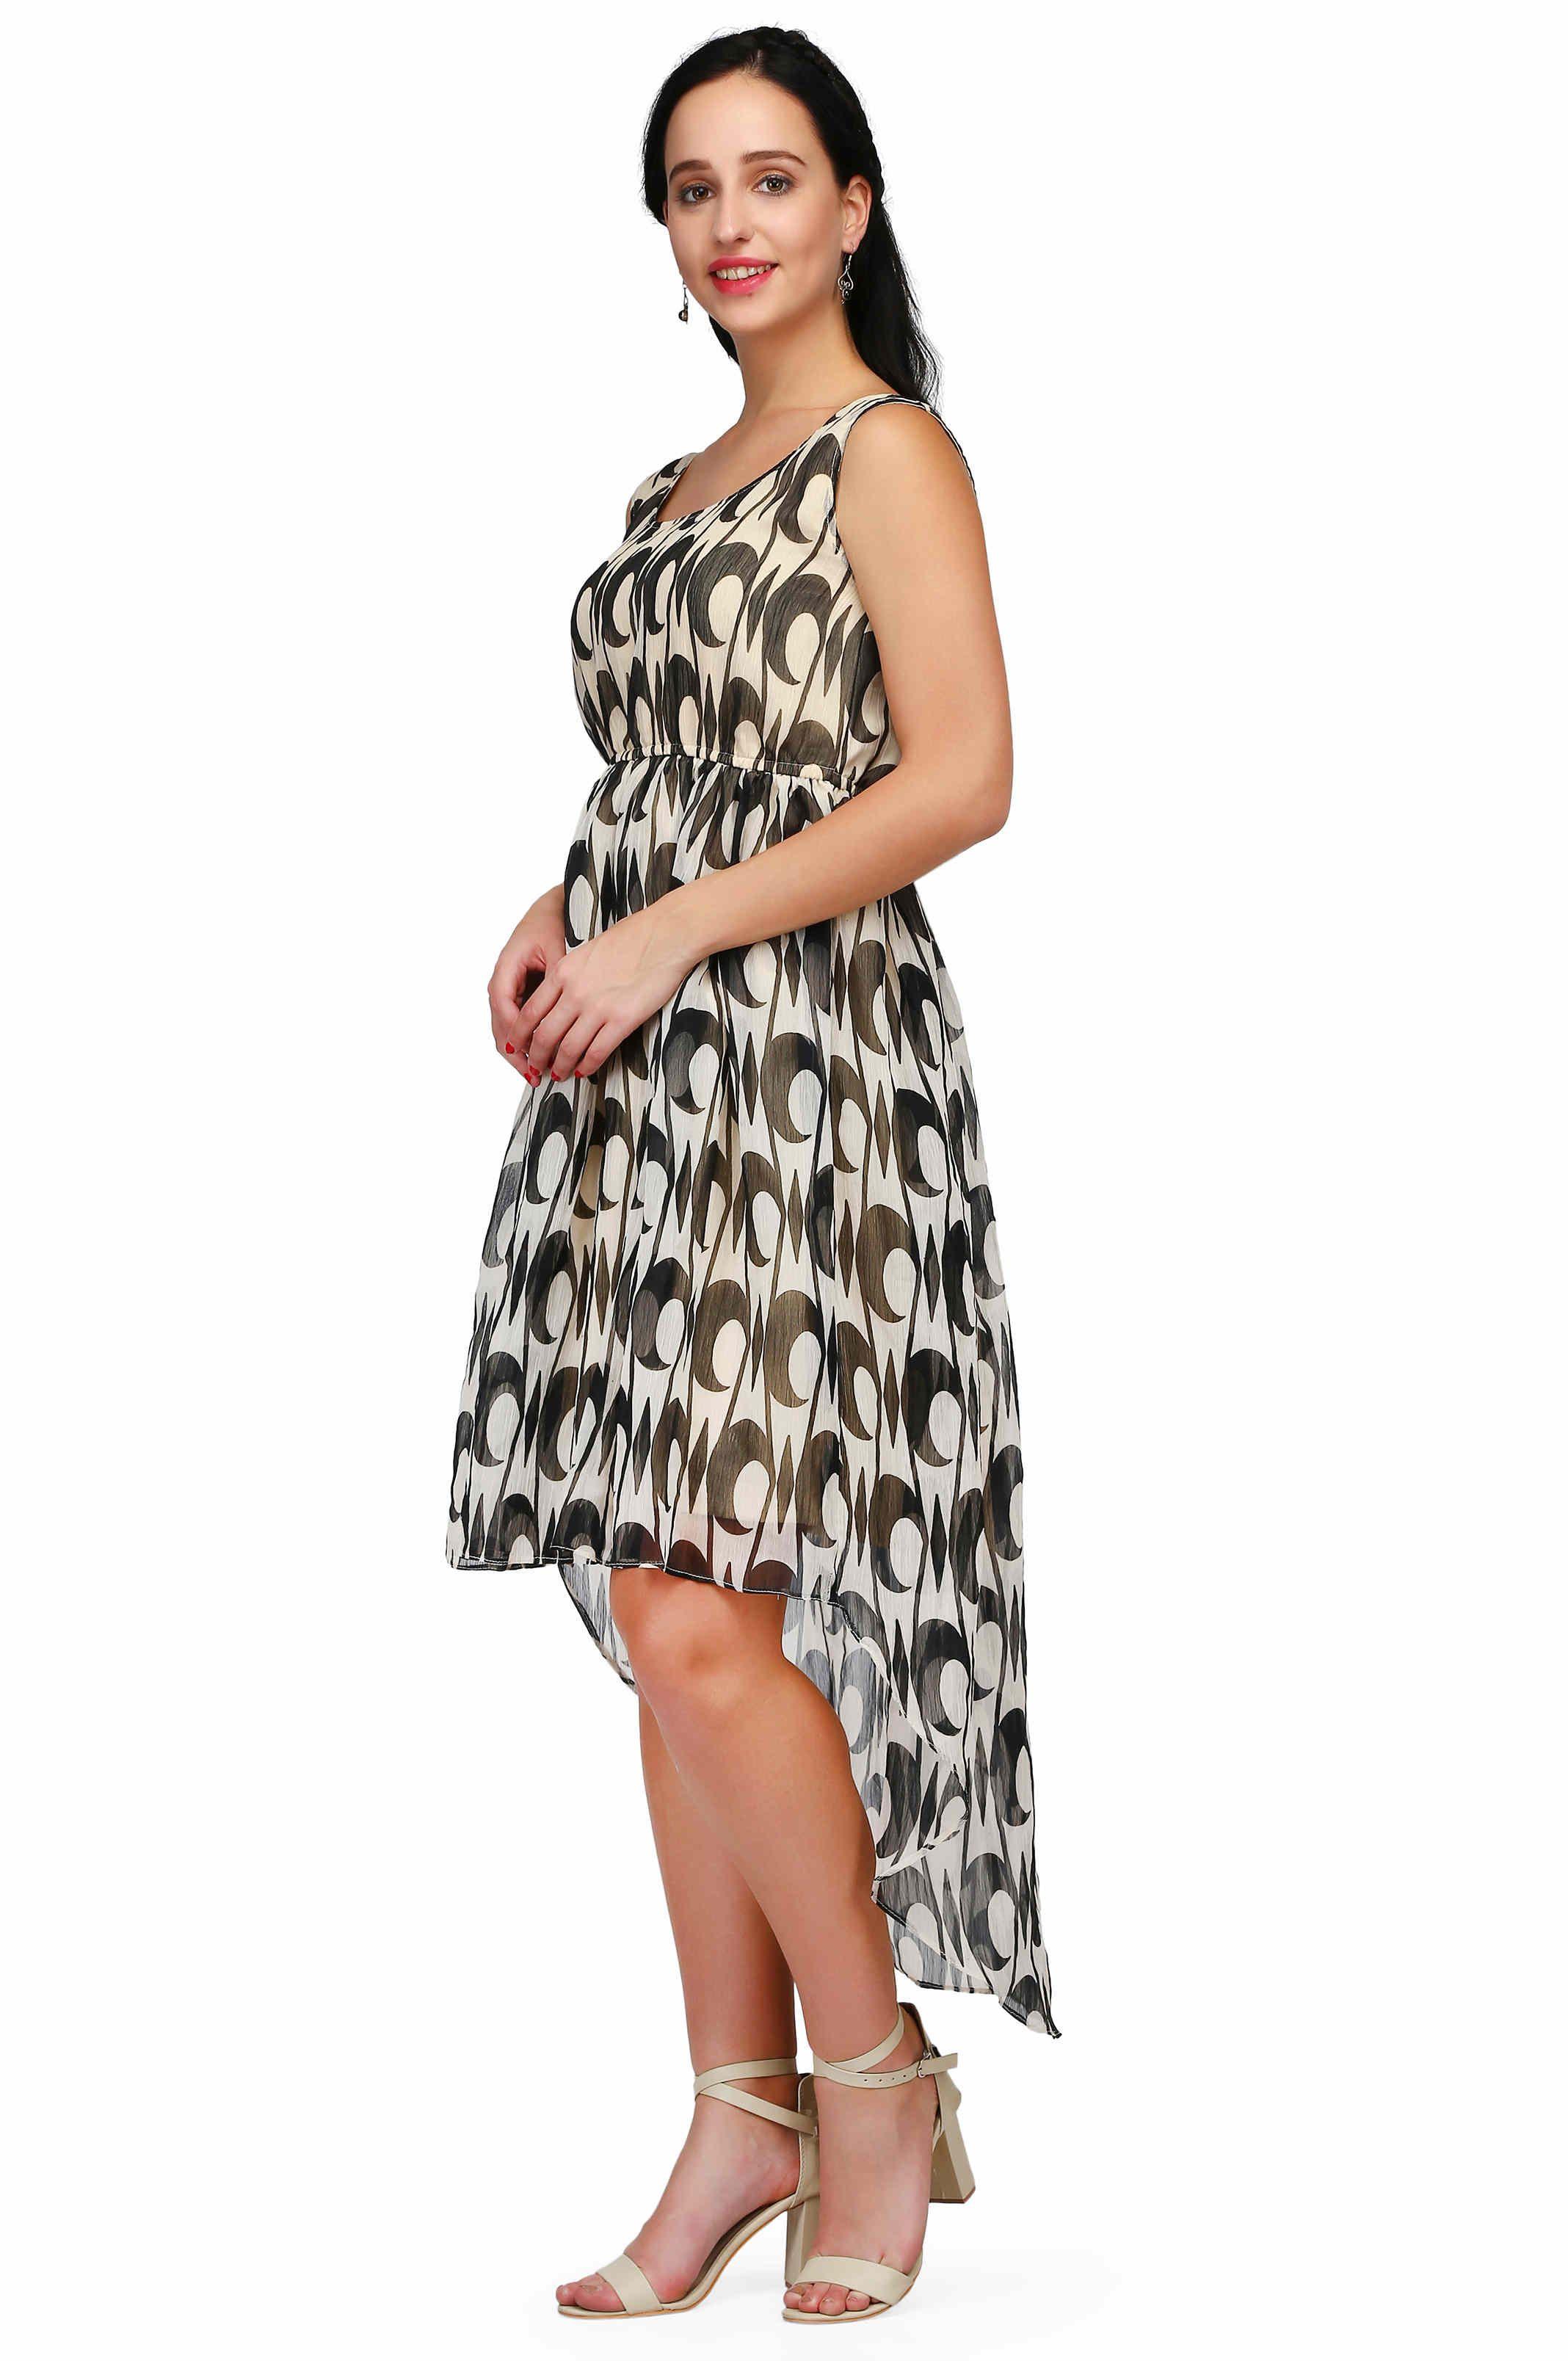 0f899ac029f4 Pret a Porter Chiffon Beige Dresses - Buy Pret a Porter Chiffon ...